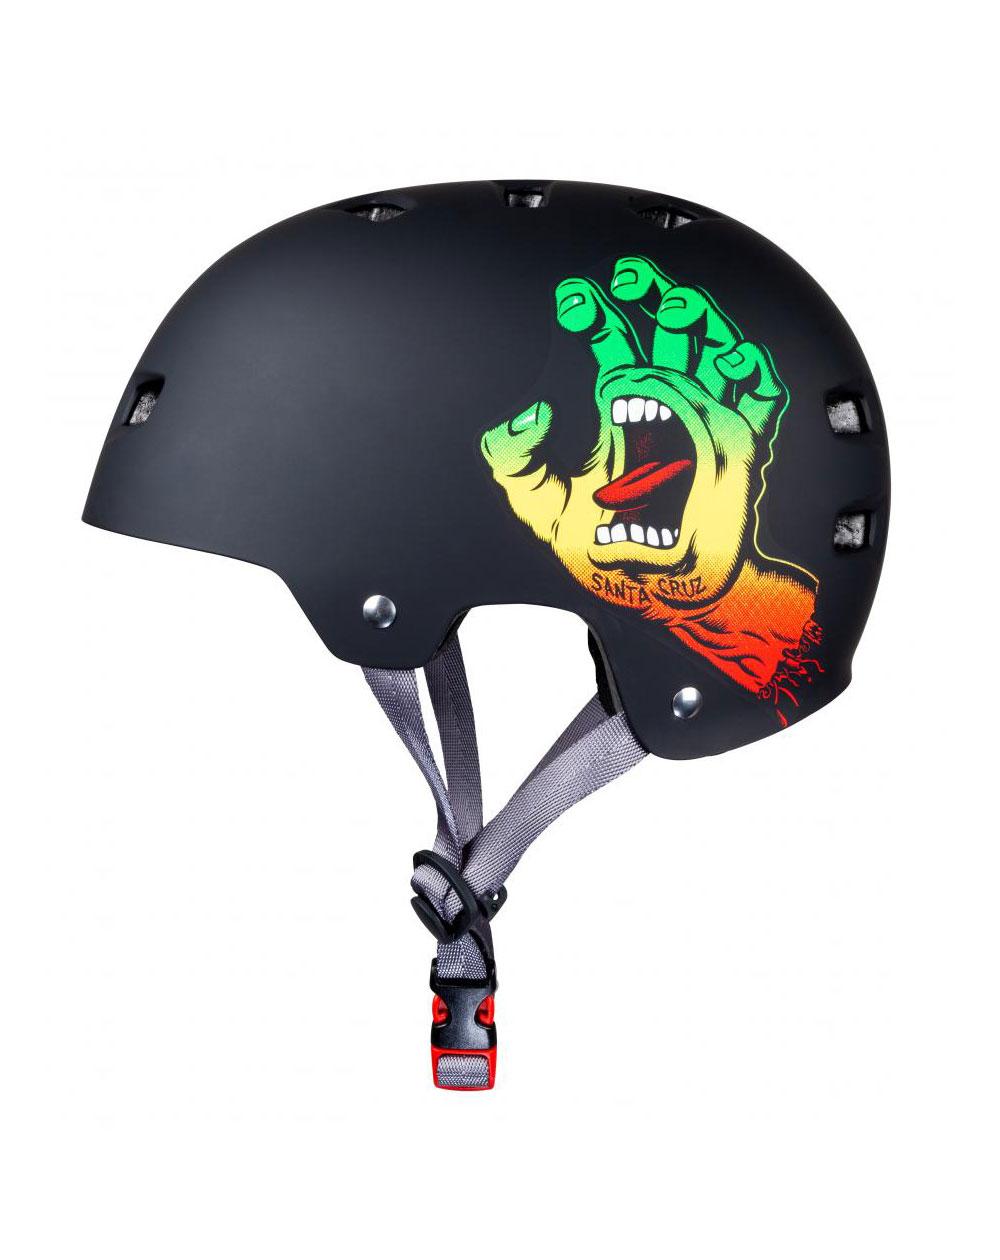 Bullet Safety Gear Casco Skateboard Bullet x Santa Cruz Screaming Hand Rasta